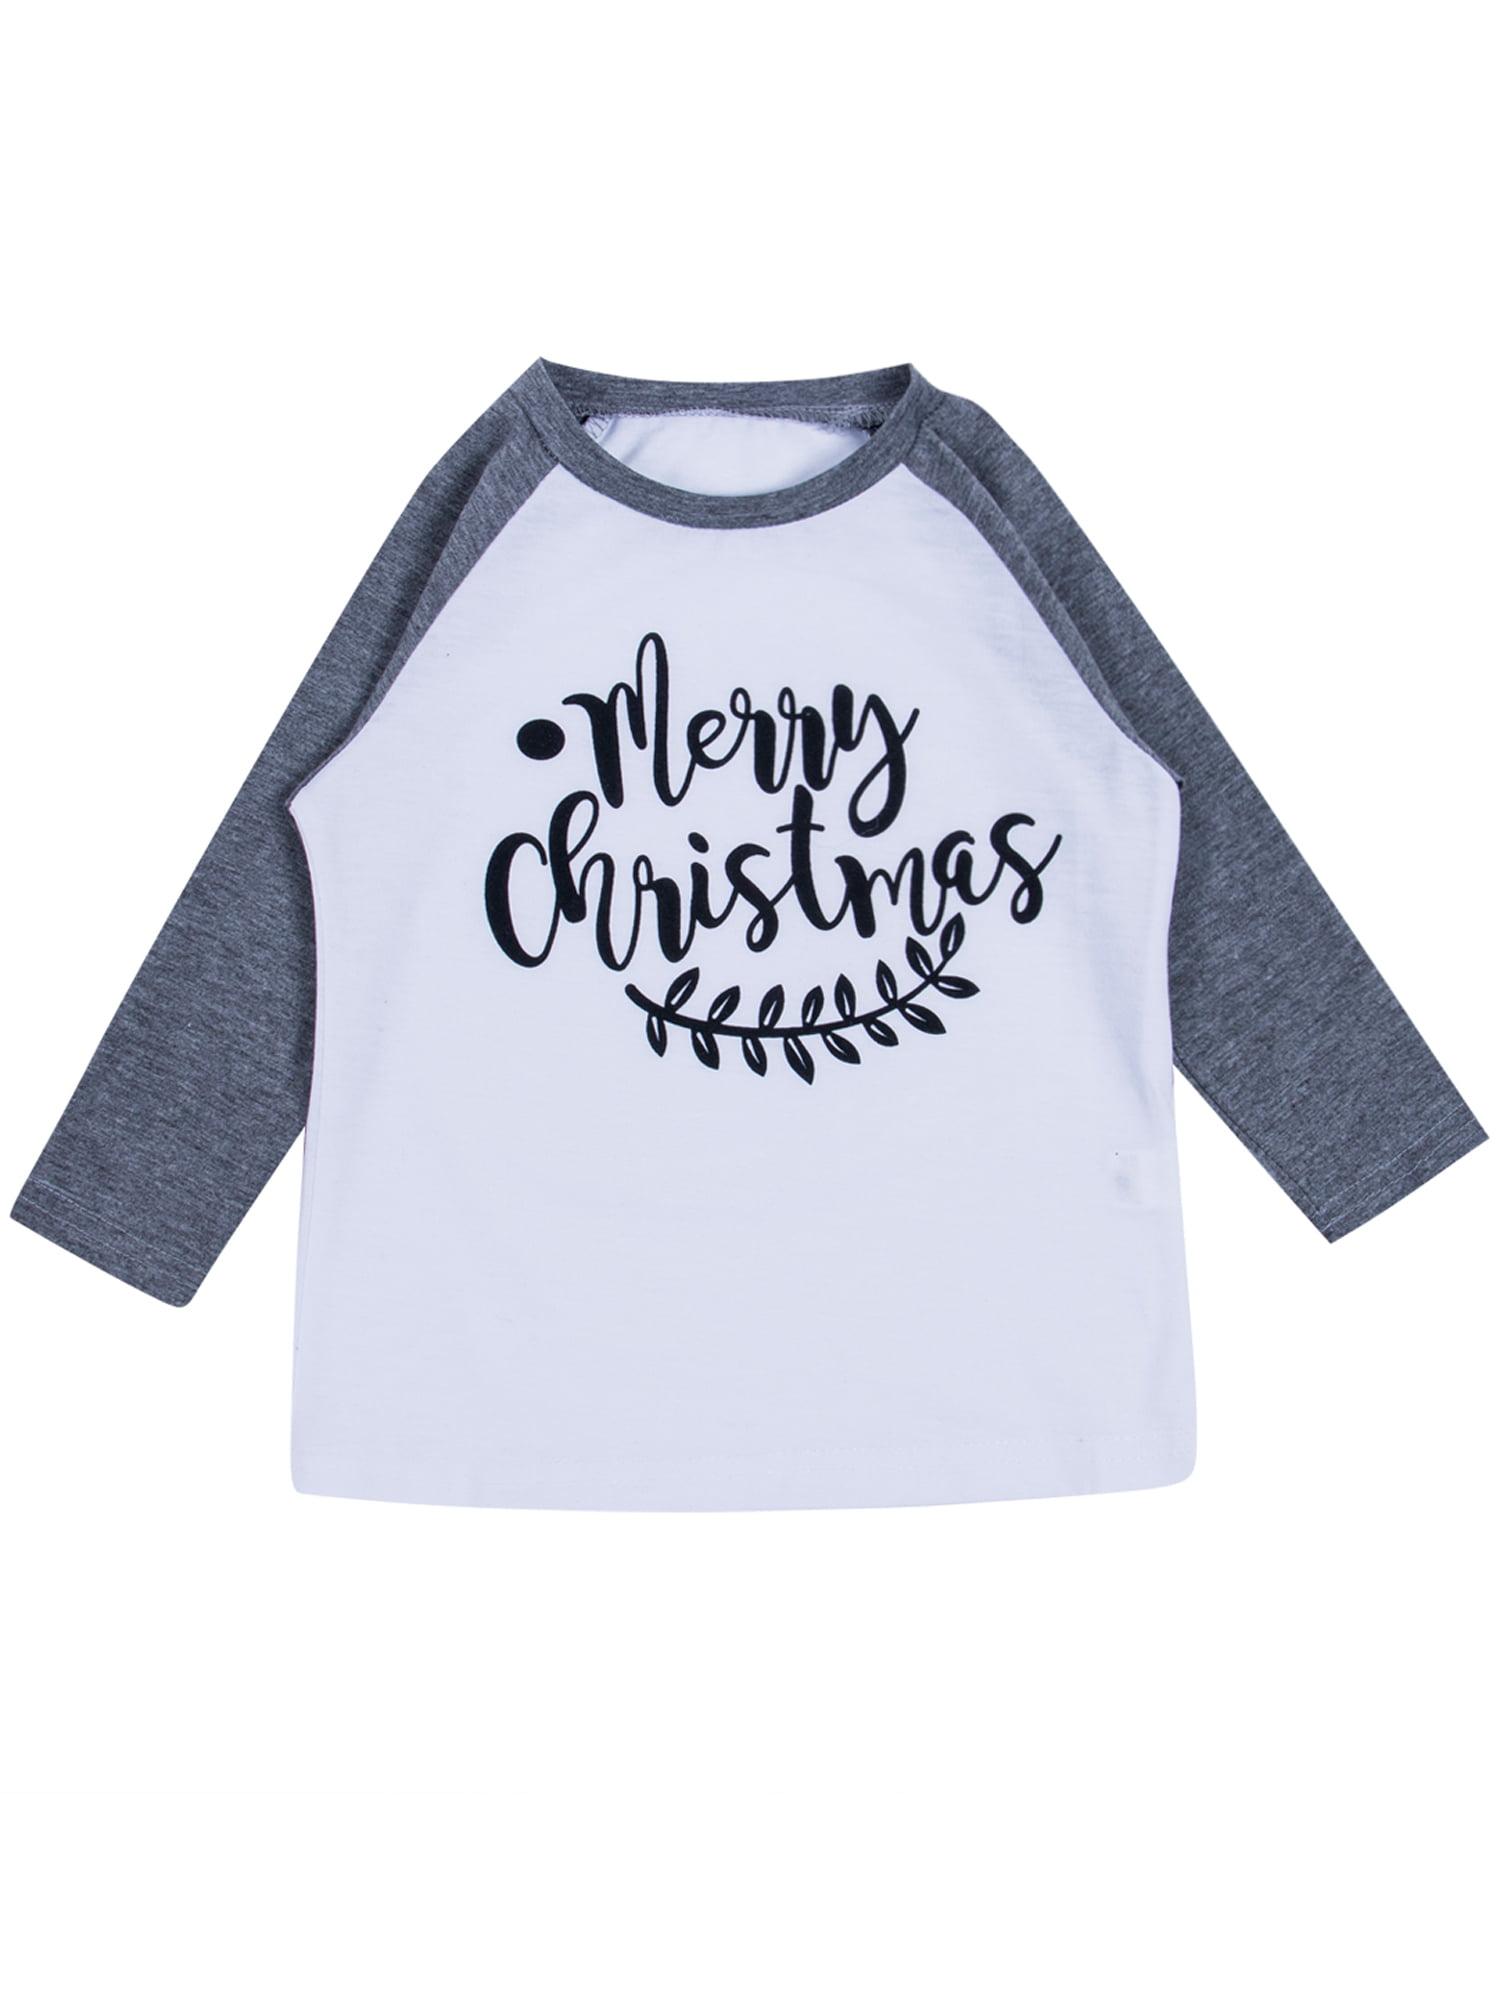 Details about  /Kids Childrens Boys Girls Xmas Jumper Sweater Christmas  Tops Sweatshirt Blouse